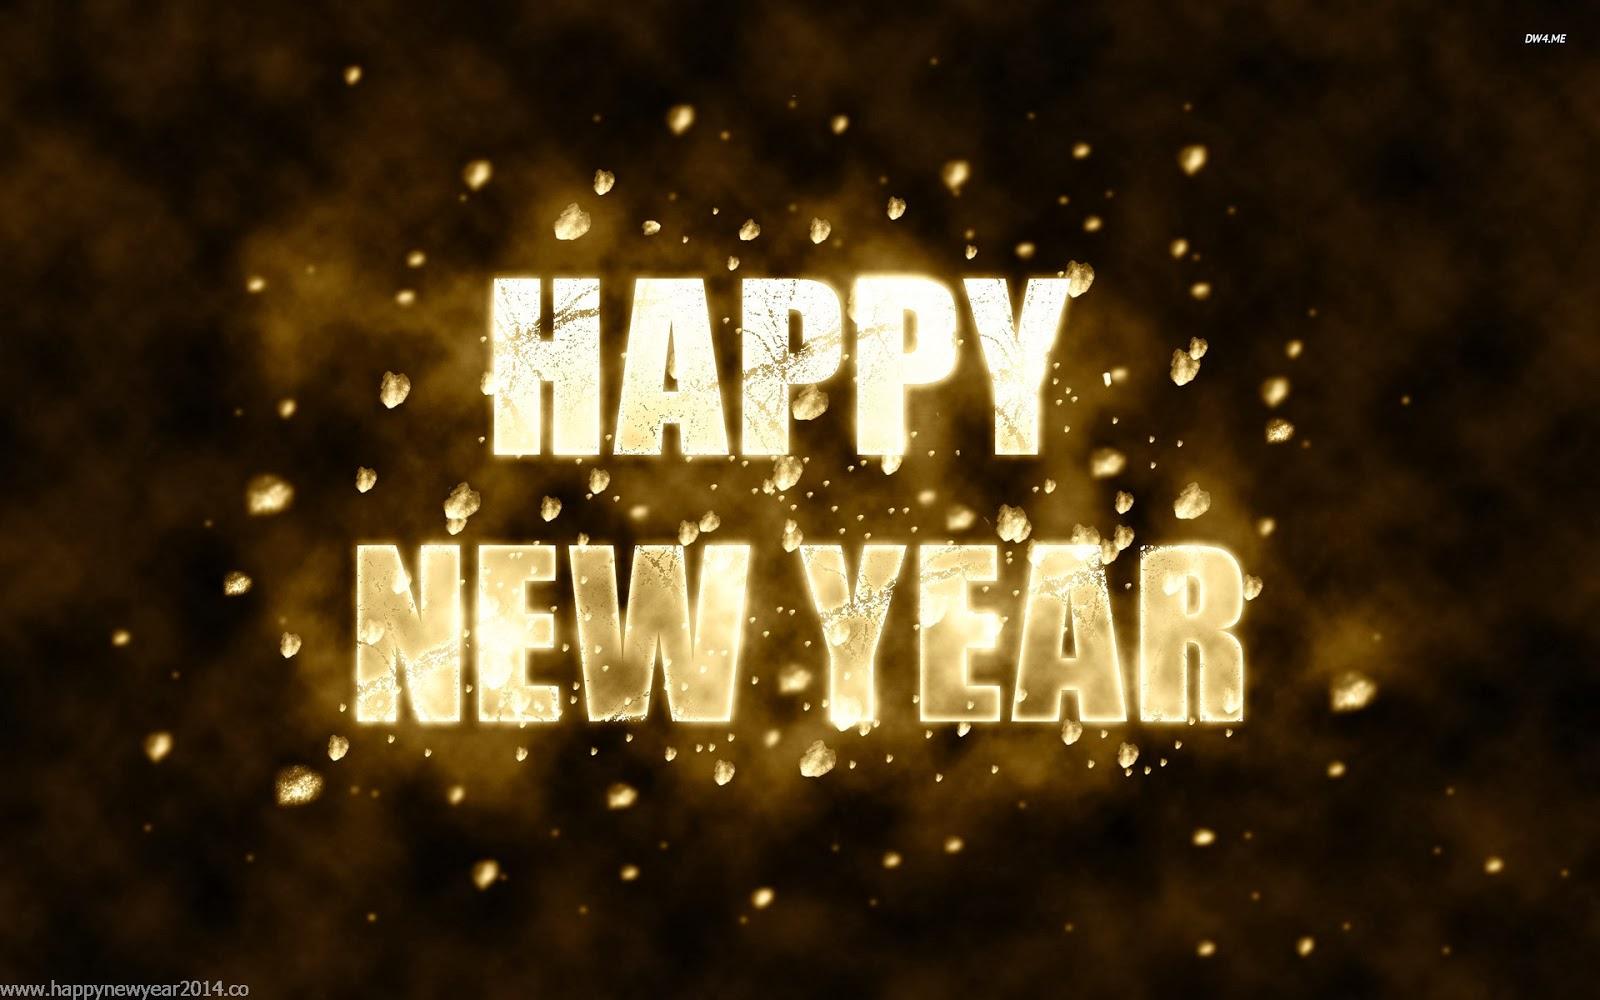 2014-happy-new-year-wallpaper-8.jpg